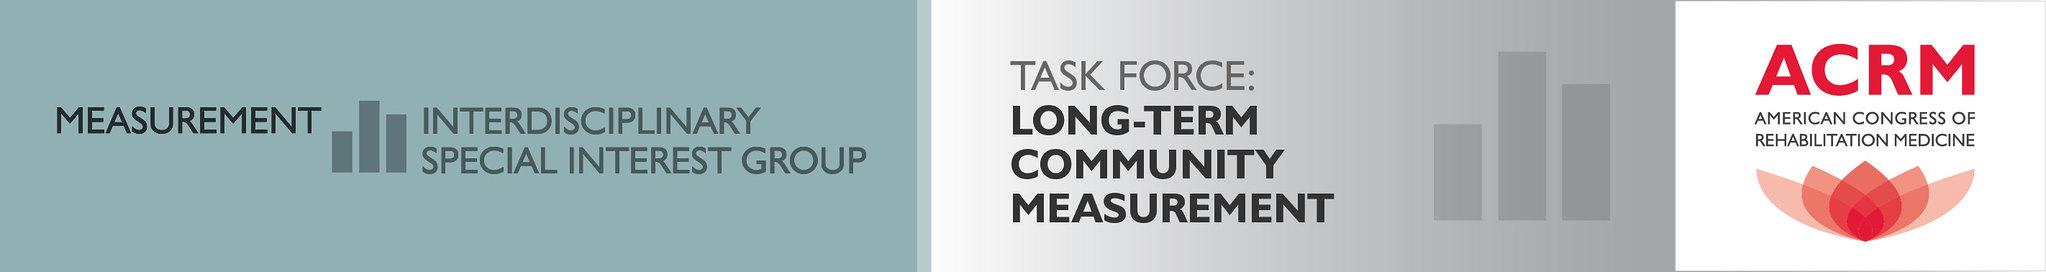 ACRM Measurement ISIG Long-Term Community Measurement Task Force banner